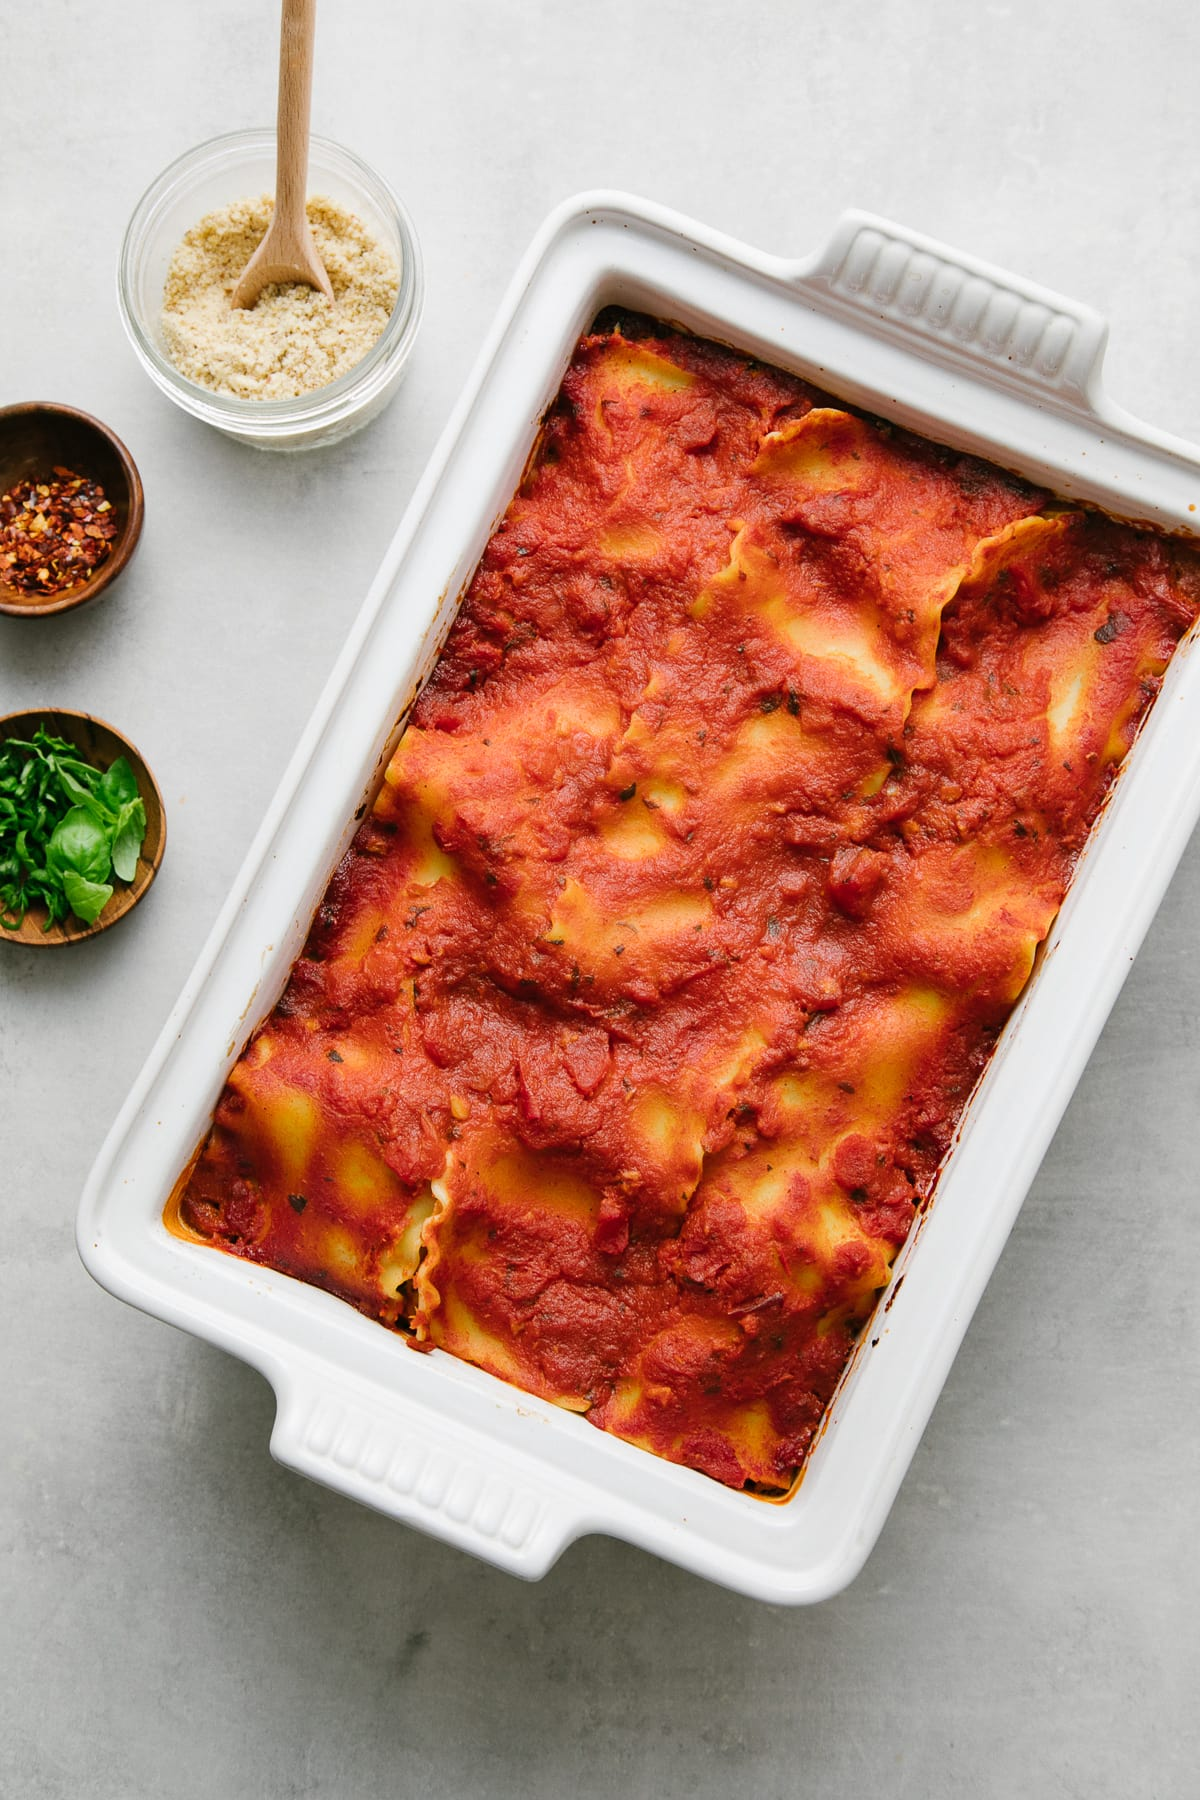 top down view of freshly made vegan lasagna in a baking dish.